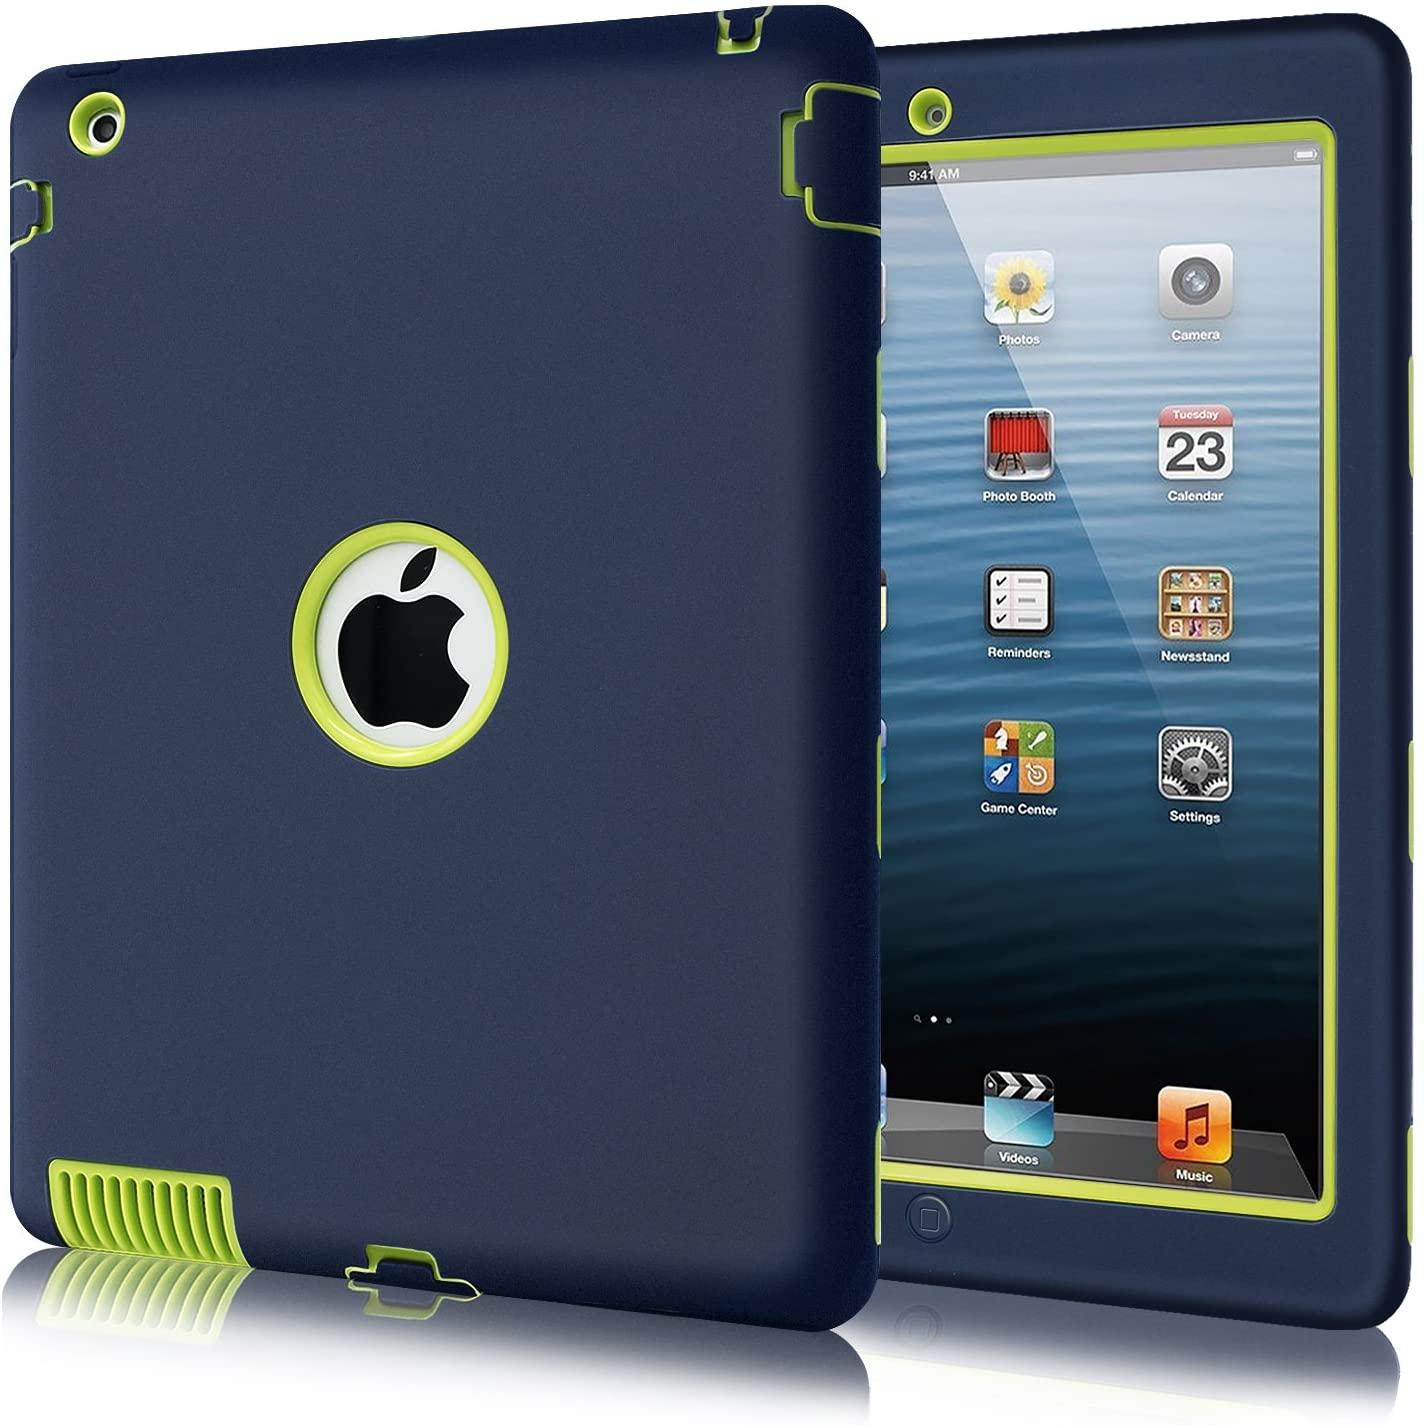 iPad 2 Case, iPad 3 Case,Fingic iPad 4 Case Full Body 3 Layer Heavy Duty Shock-Absorption High Impact Resistant Hybrid Rugged Protective Case for Apple iPad 2/3/4 Retina,Navy Blue&Green